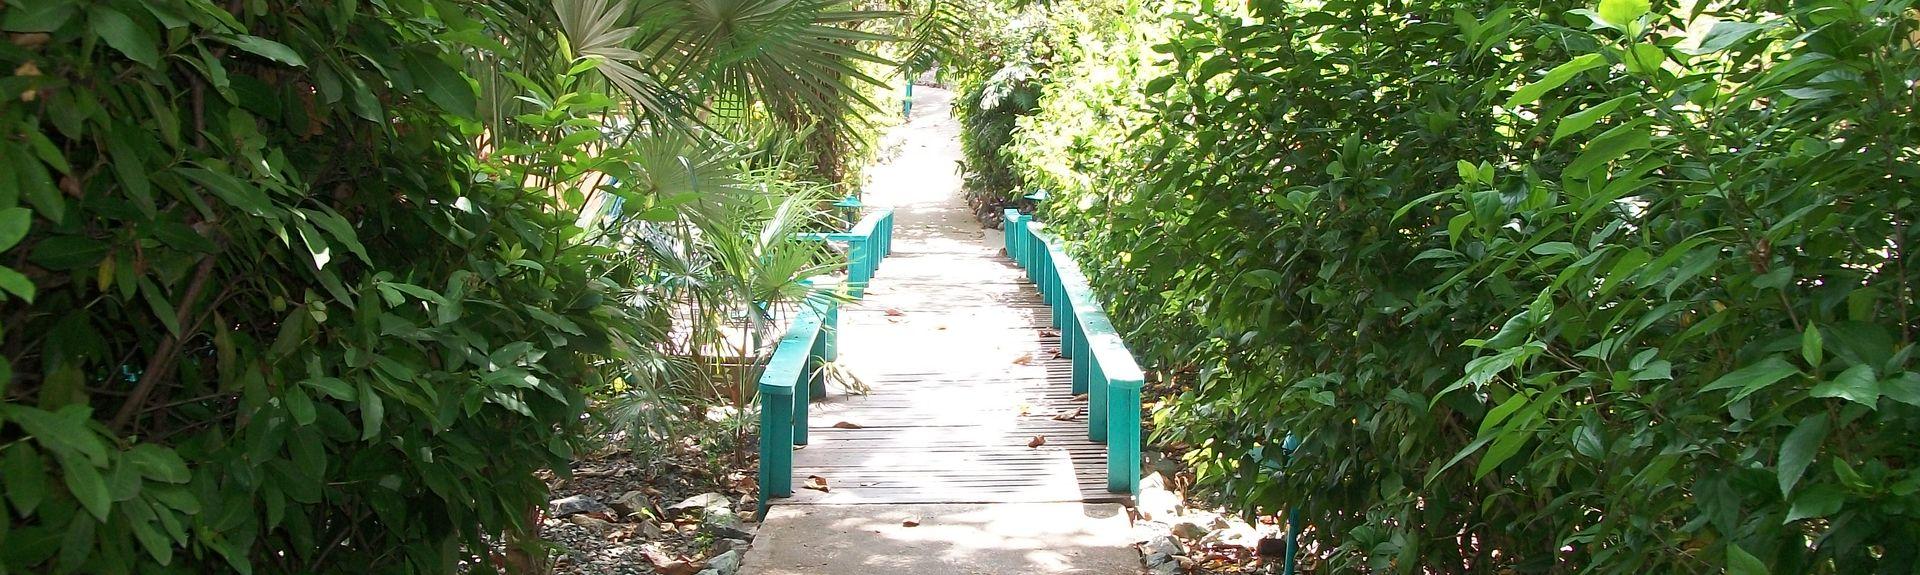 Smith Bay, St. Thomas, US Virgin Islands